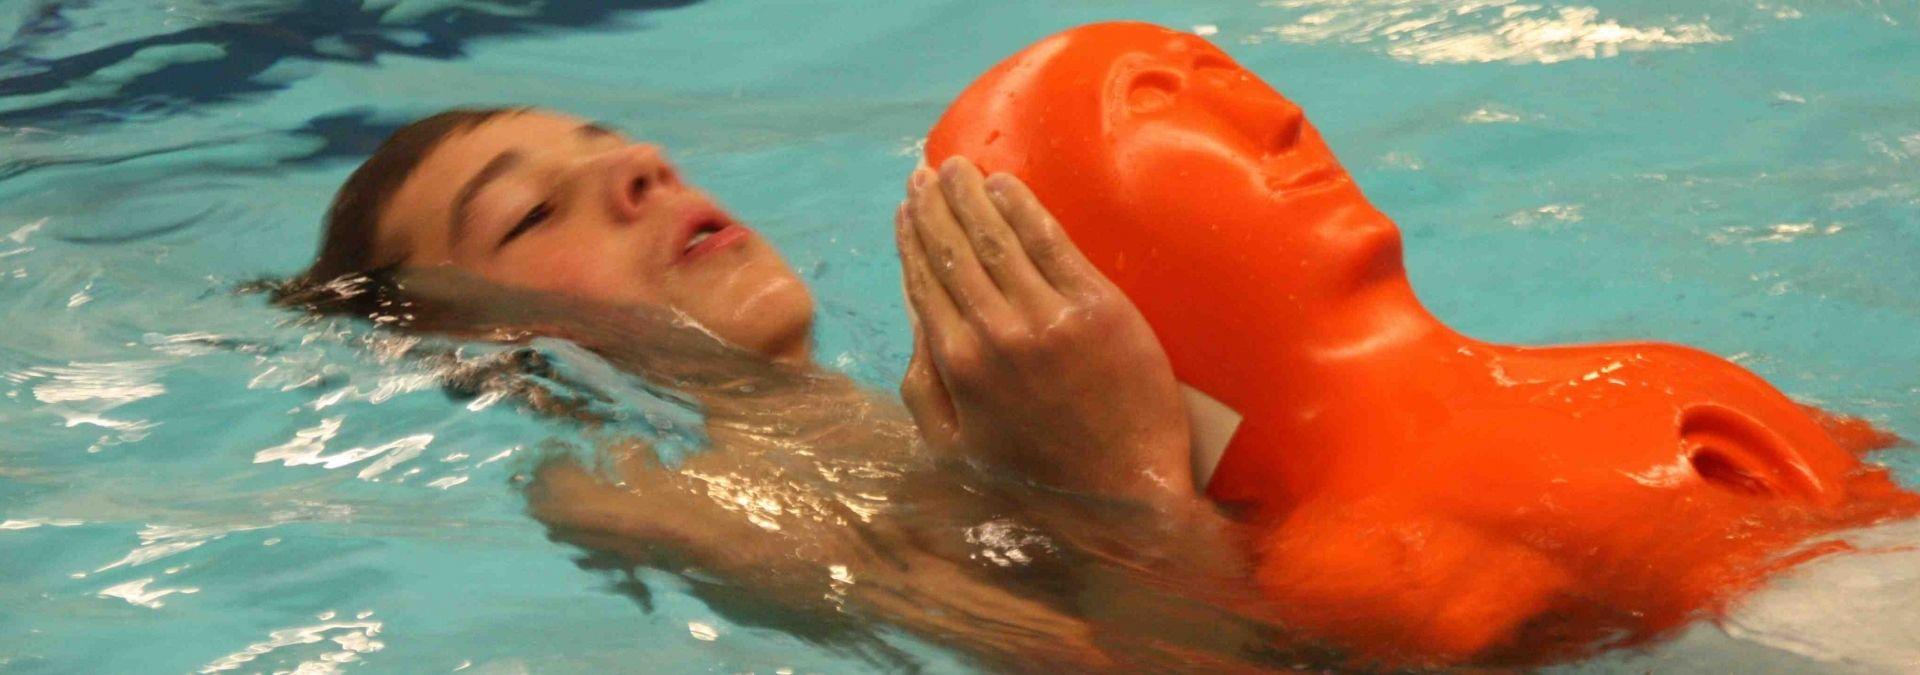 Reddingsbrigade zwemmend redden opleiding duikpop